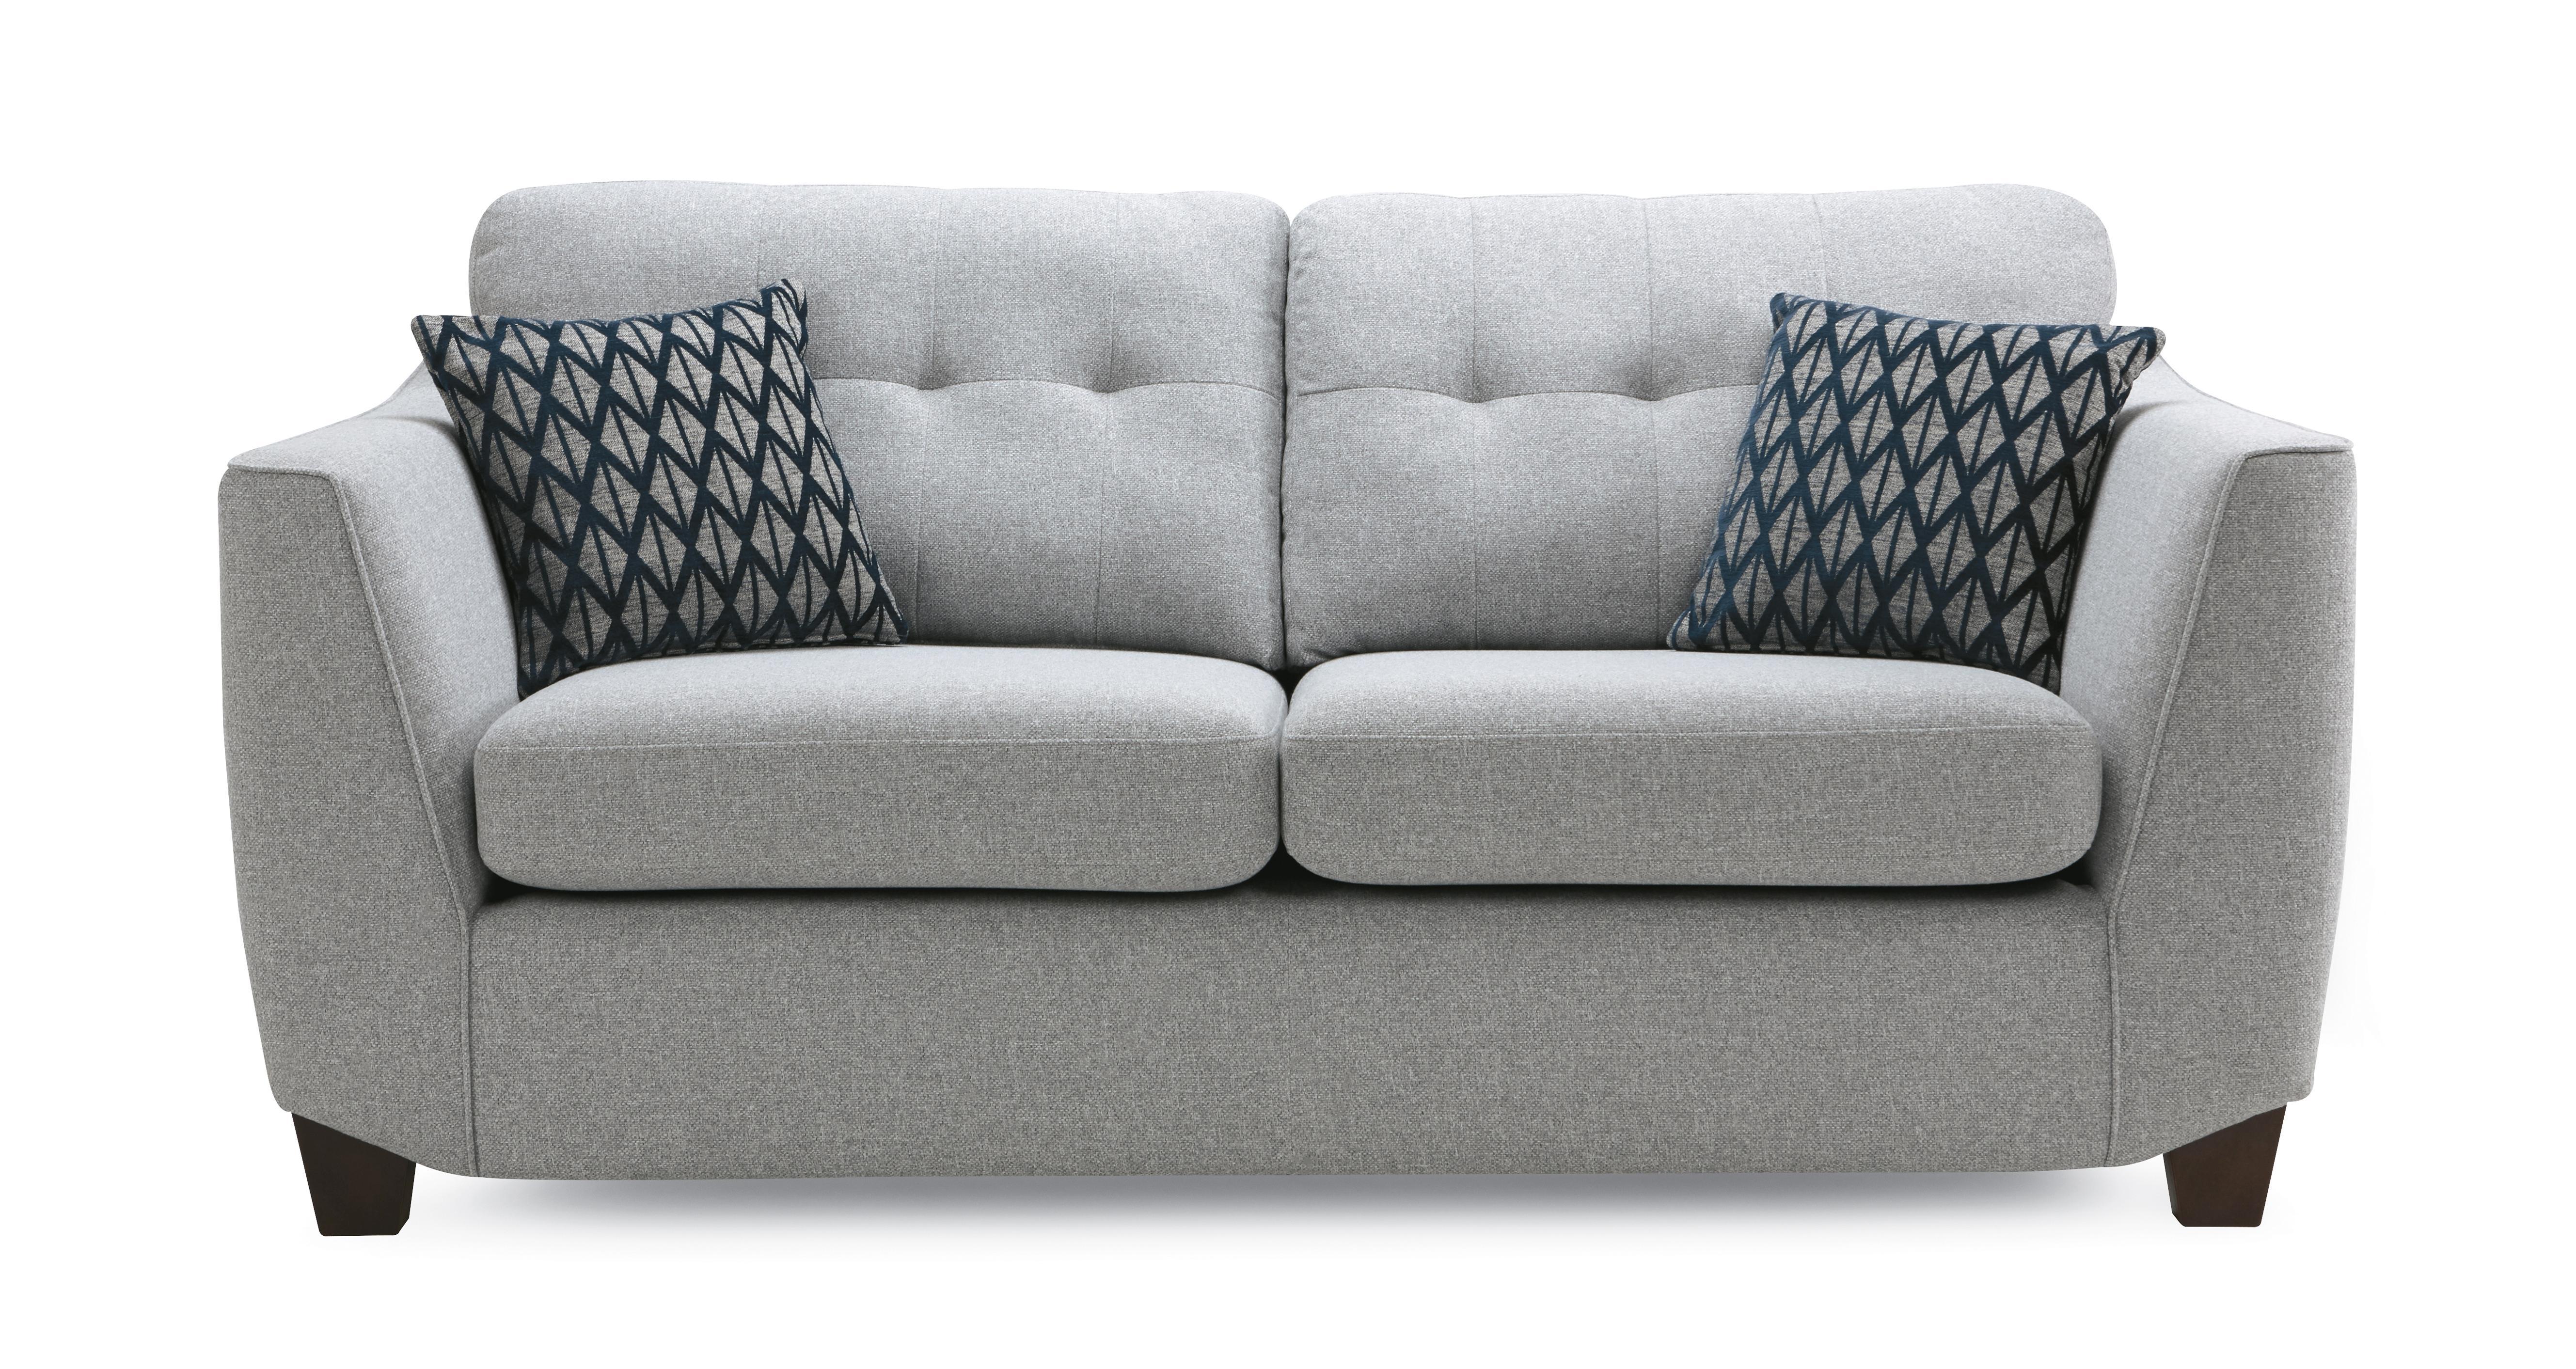 Sofa company uk reviews - Sofa company paderborn ...